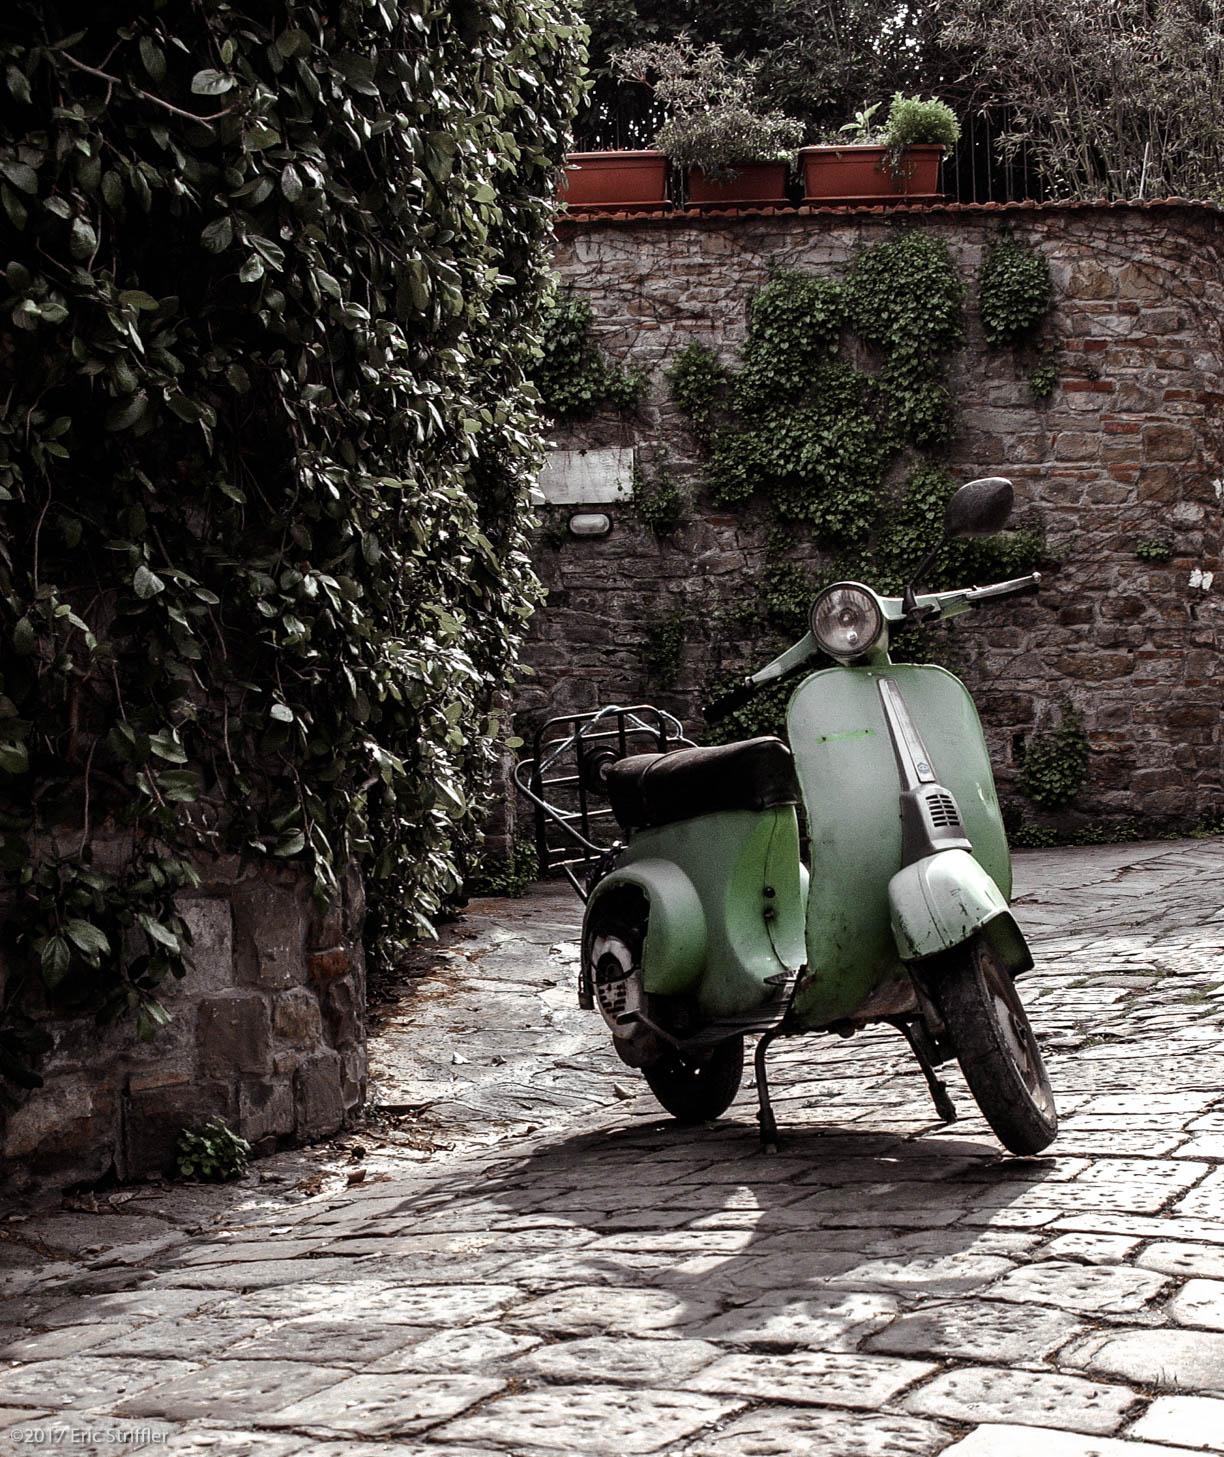 eric_striffler_photography_travel-93.jpg